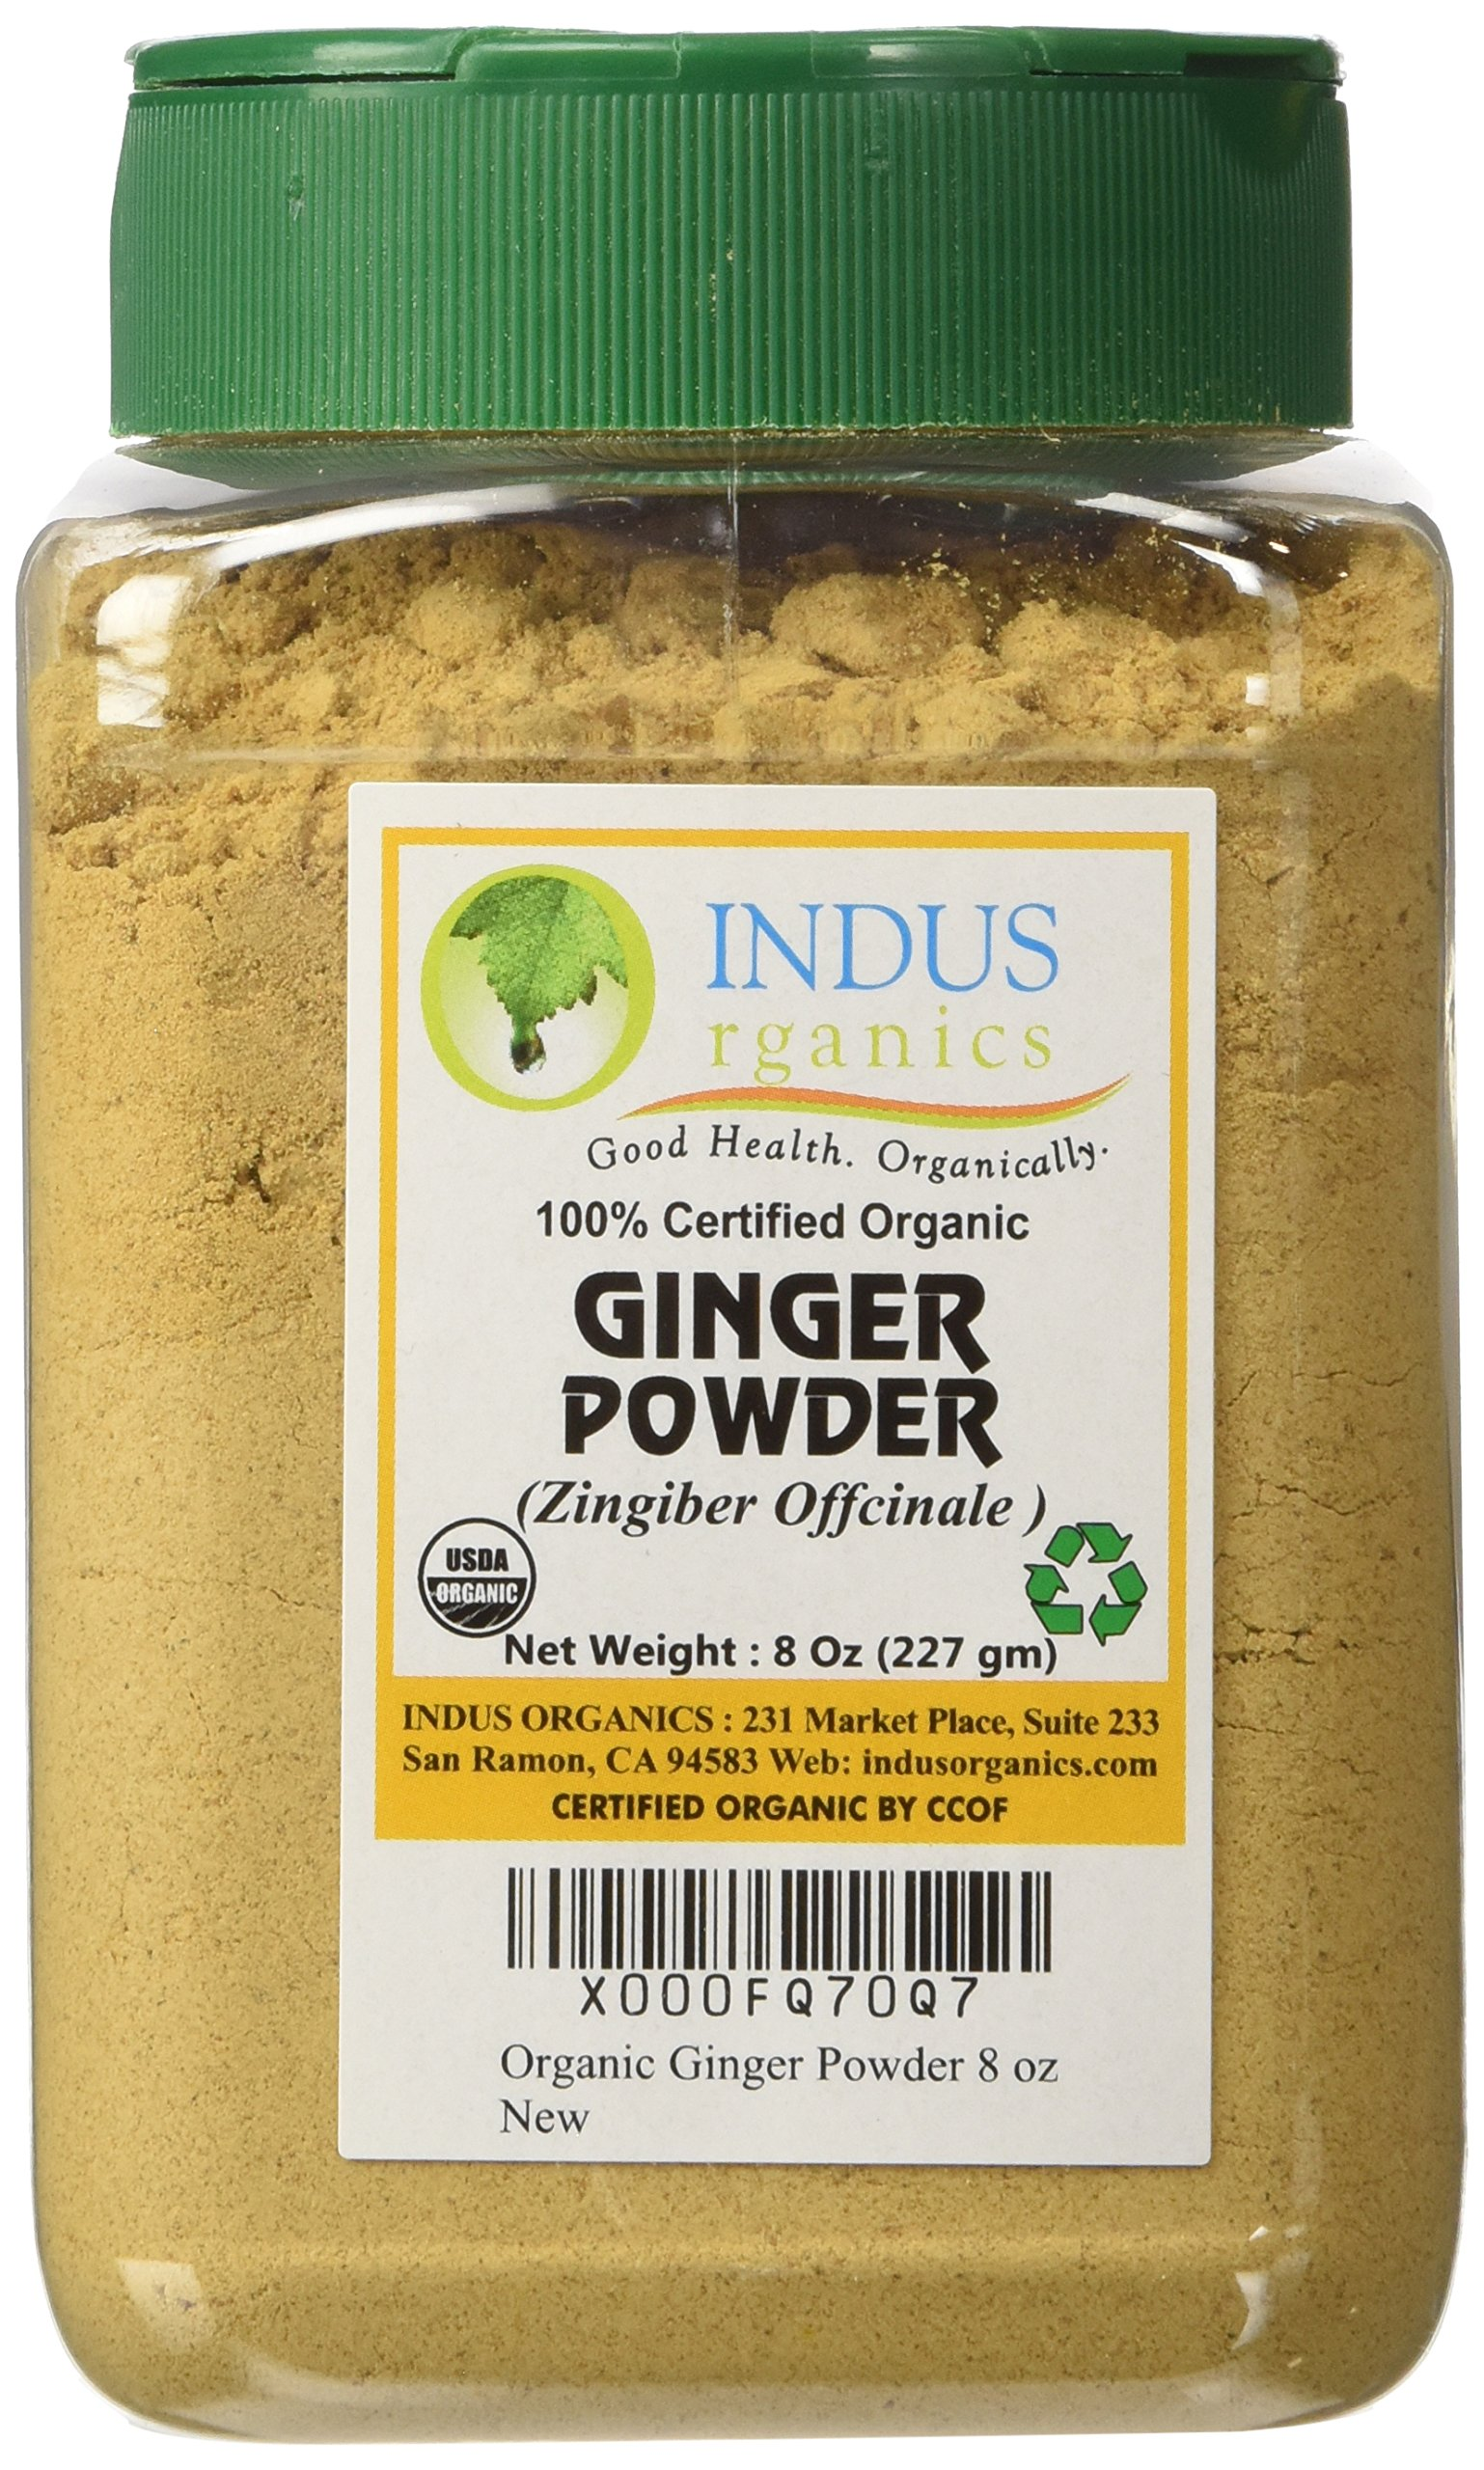 Indus Organics Ginger Powder, 8 Oz Jar, Sulfite Free, Premium Grade, High Purity, Freshly Packed